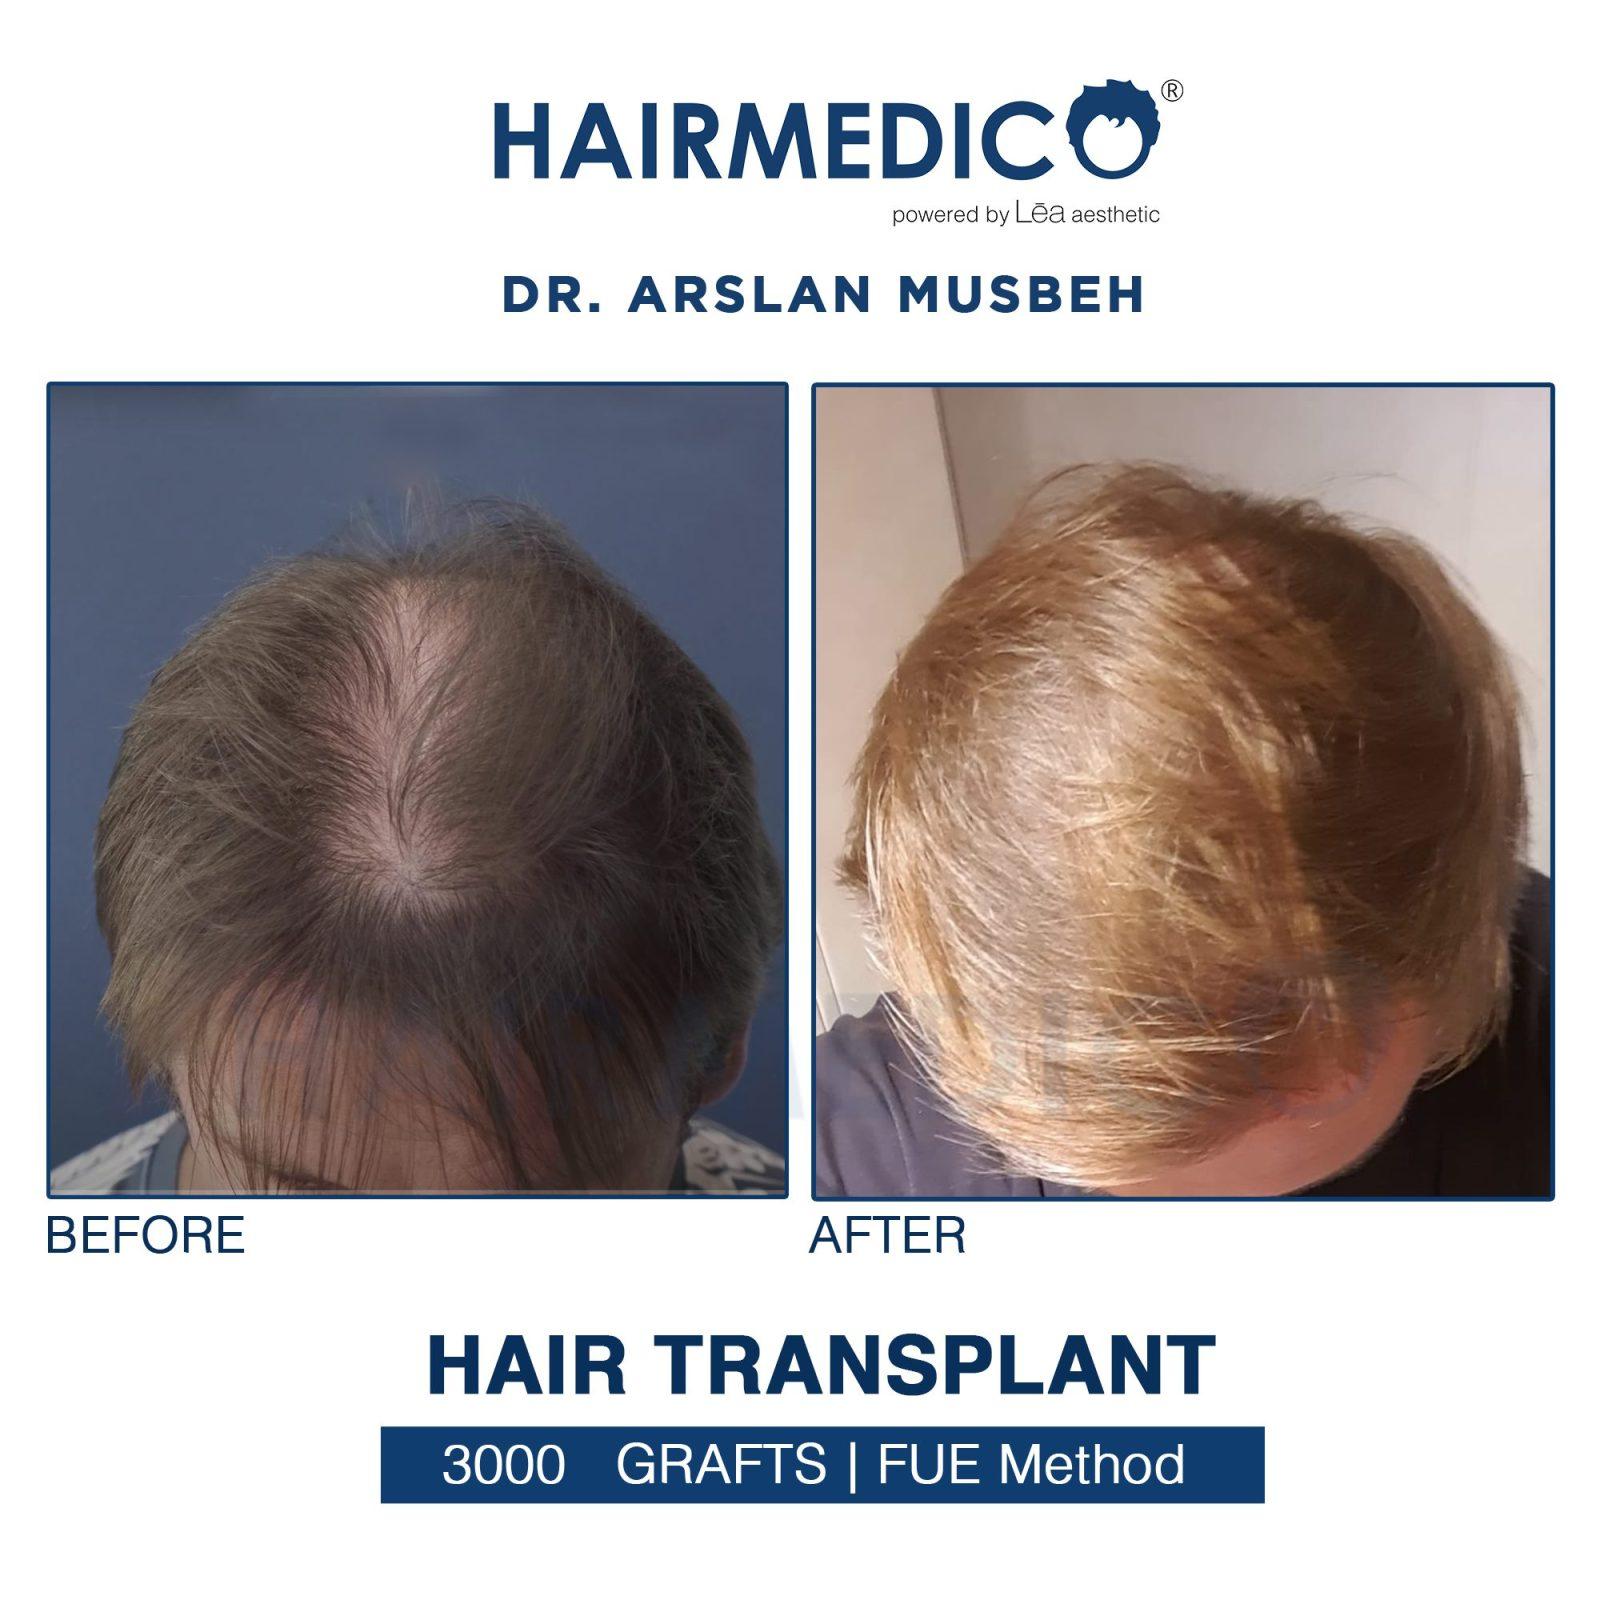 Hair Transplant in Turkey dr arslan